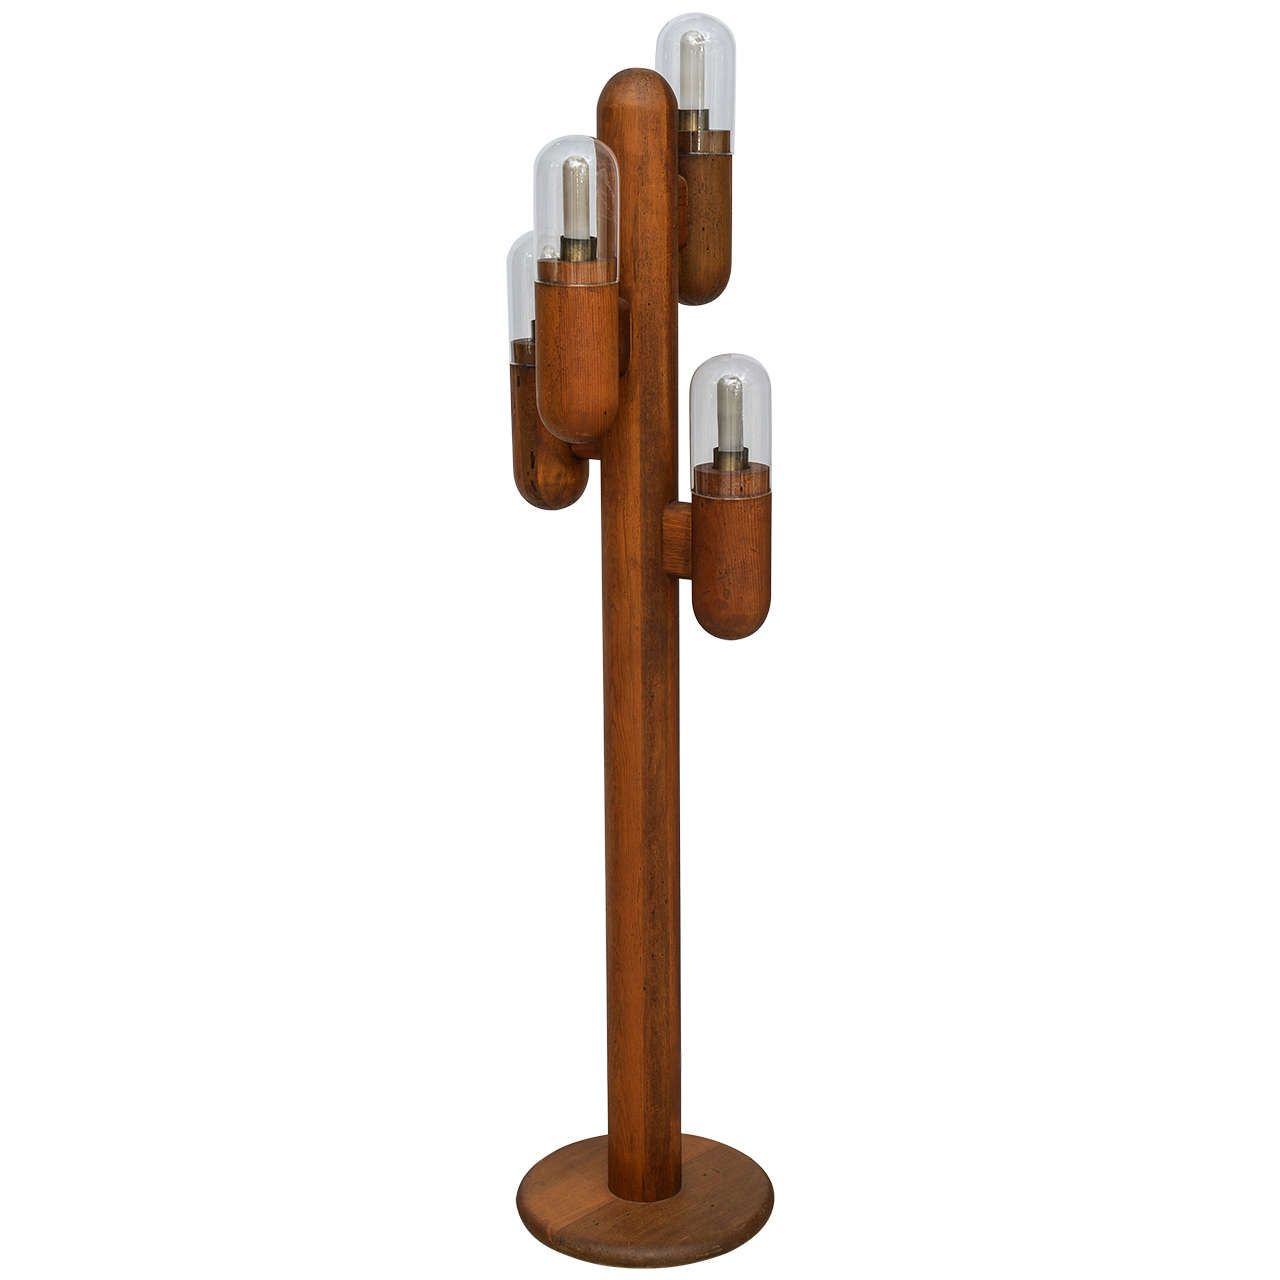 Mid Century Modern Wood Cactus Shaped Floor Lamp